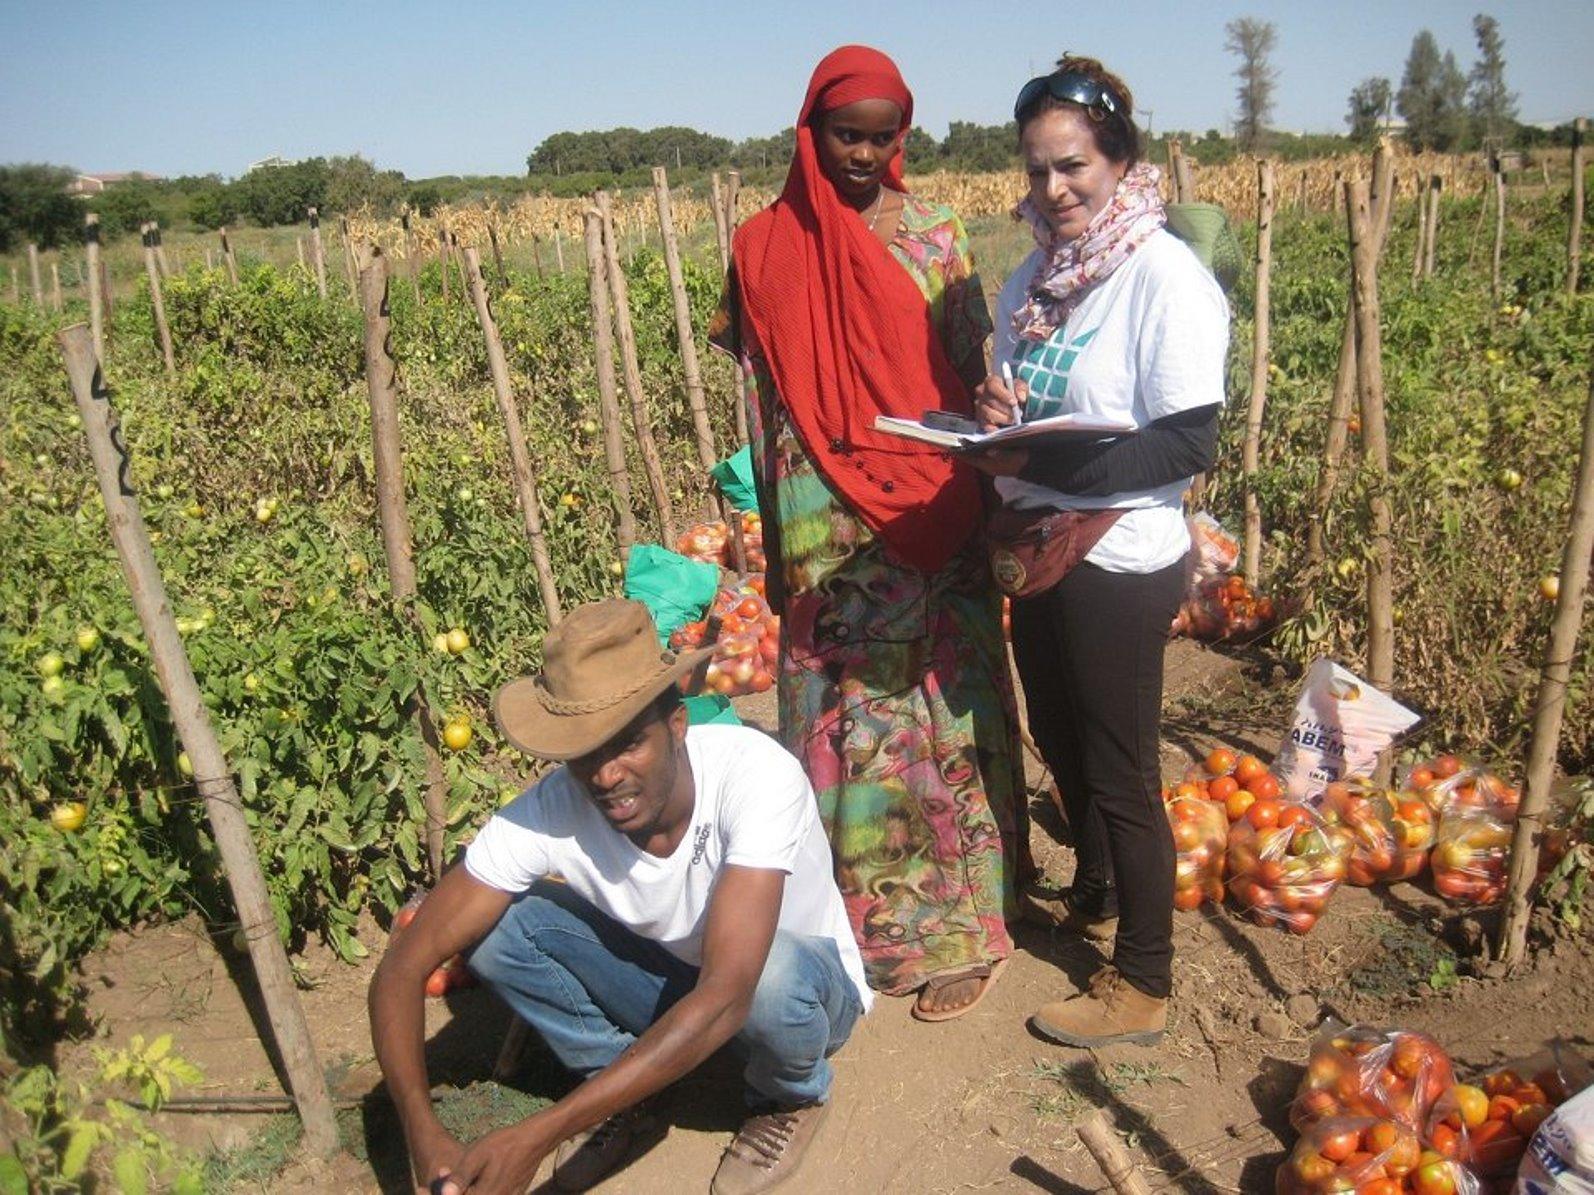 Israeli NGO Fair Planet is helping Ethiopian tomato farmers improve their crops. Photo: courtesy